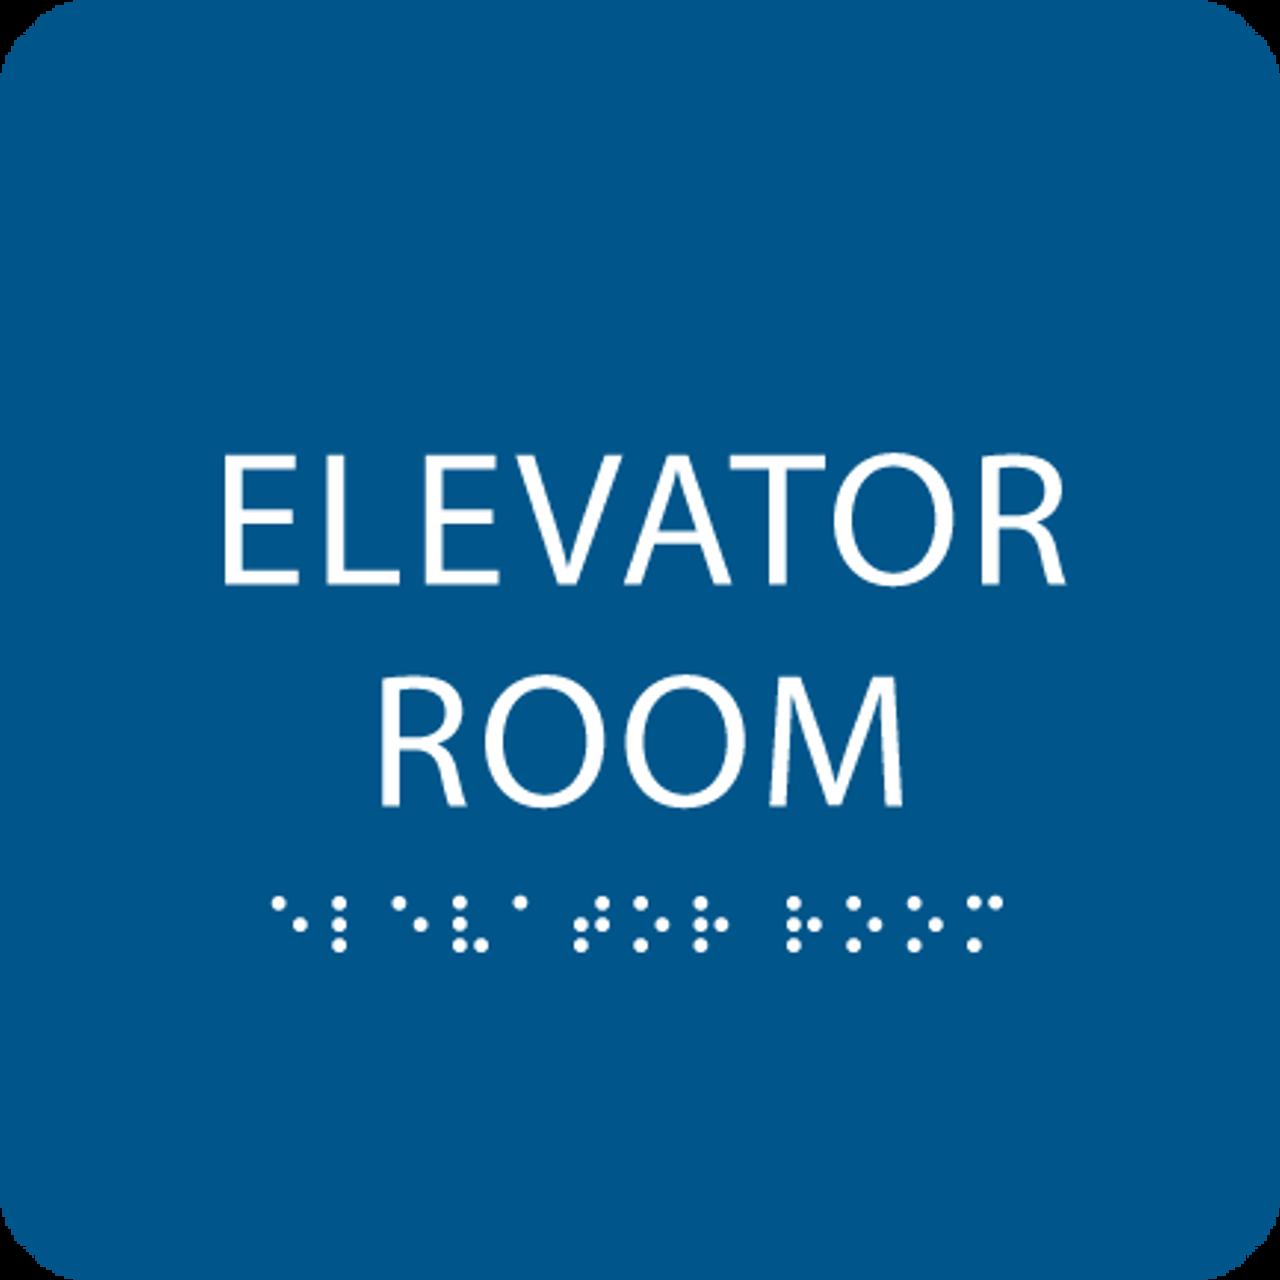 Royal  Elevator Room ADA Sign